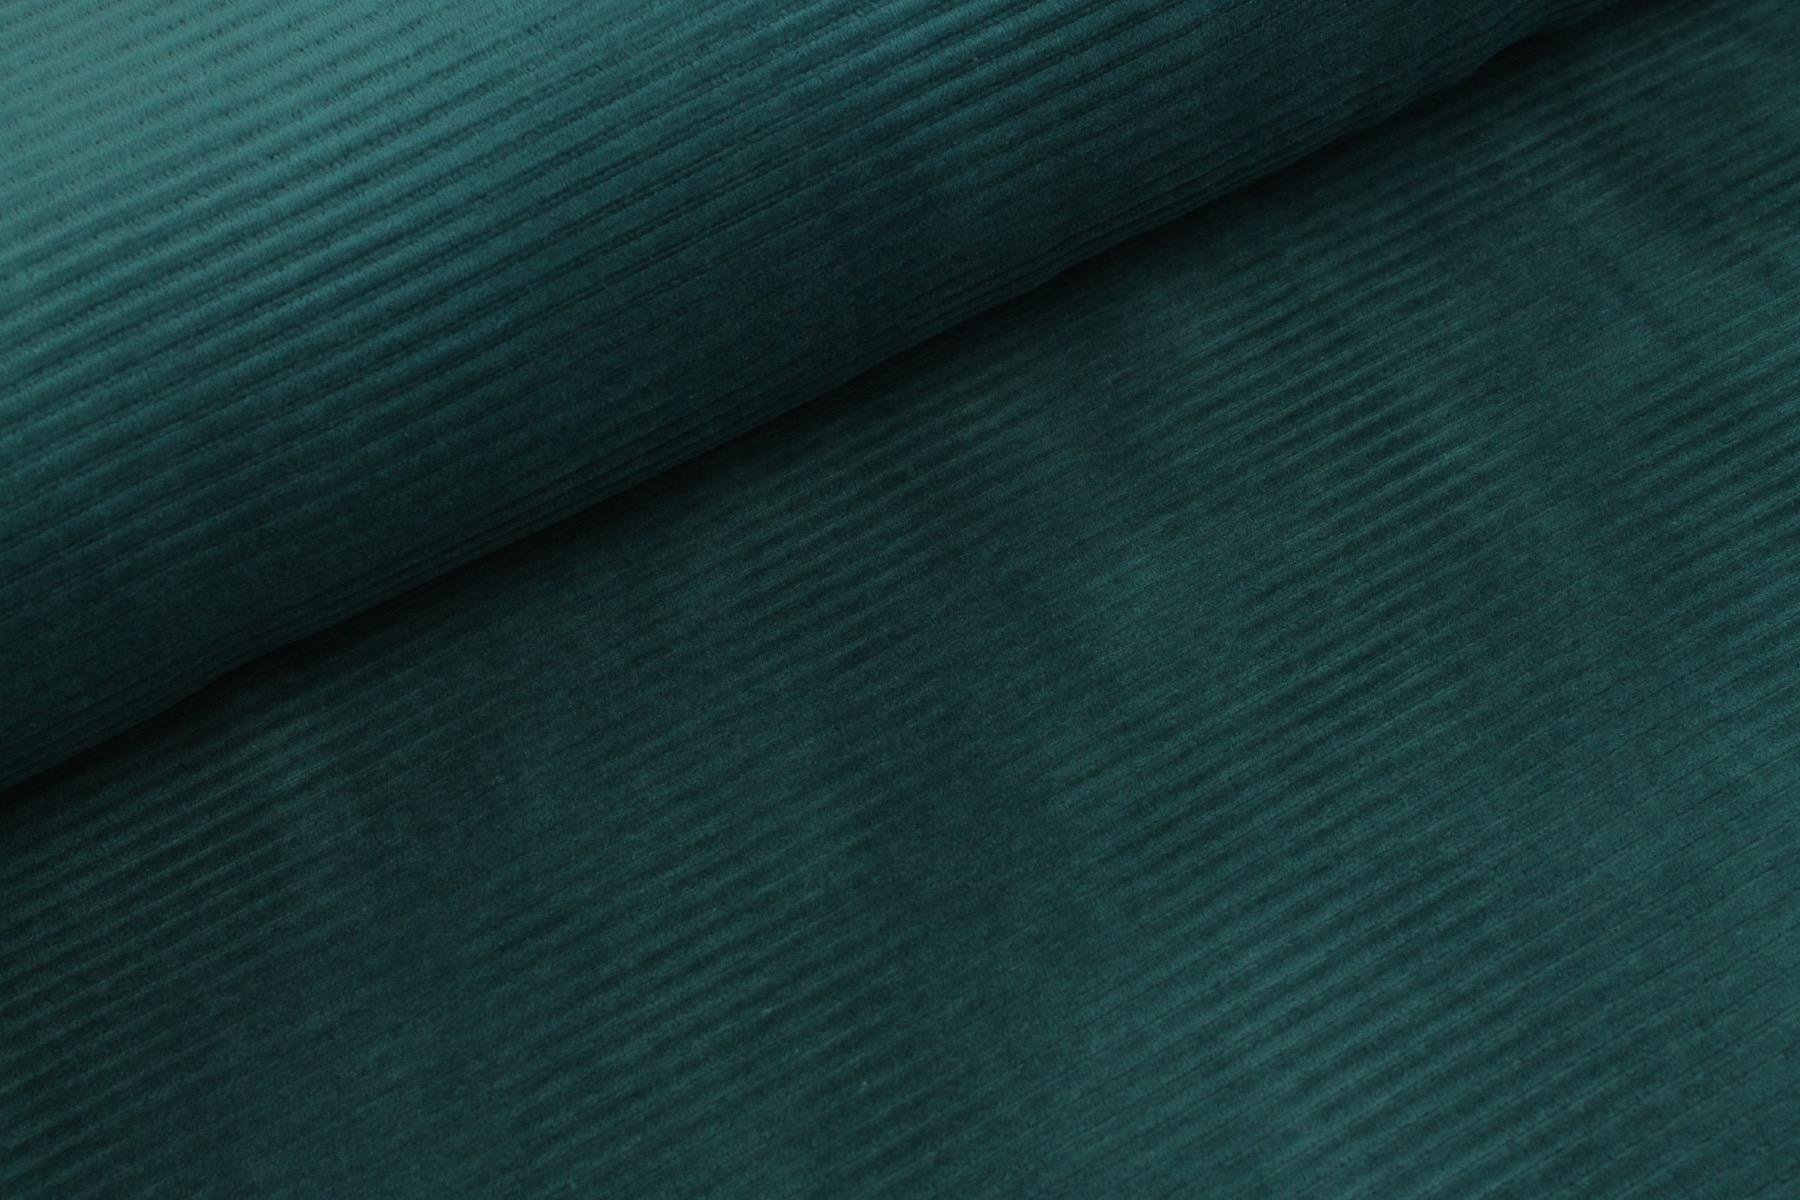 Cotton Knit Big Cord - Donker Petrol